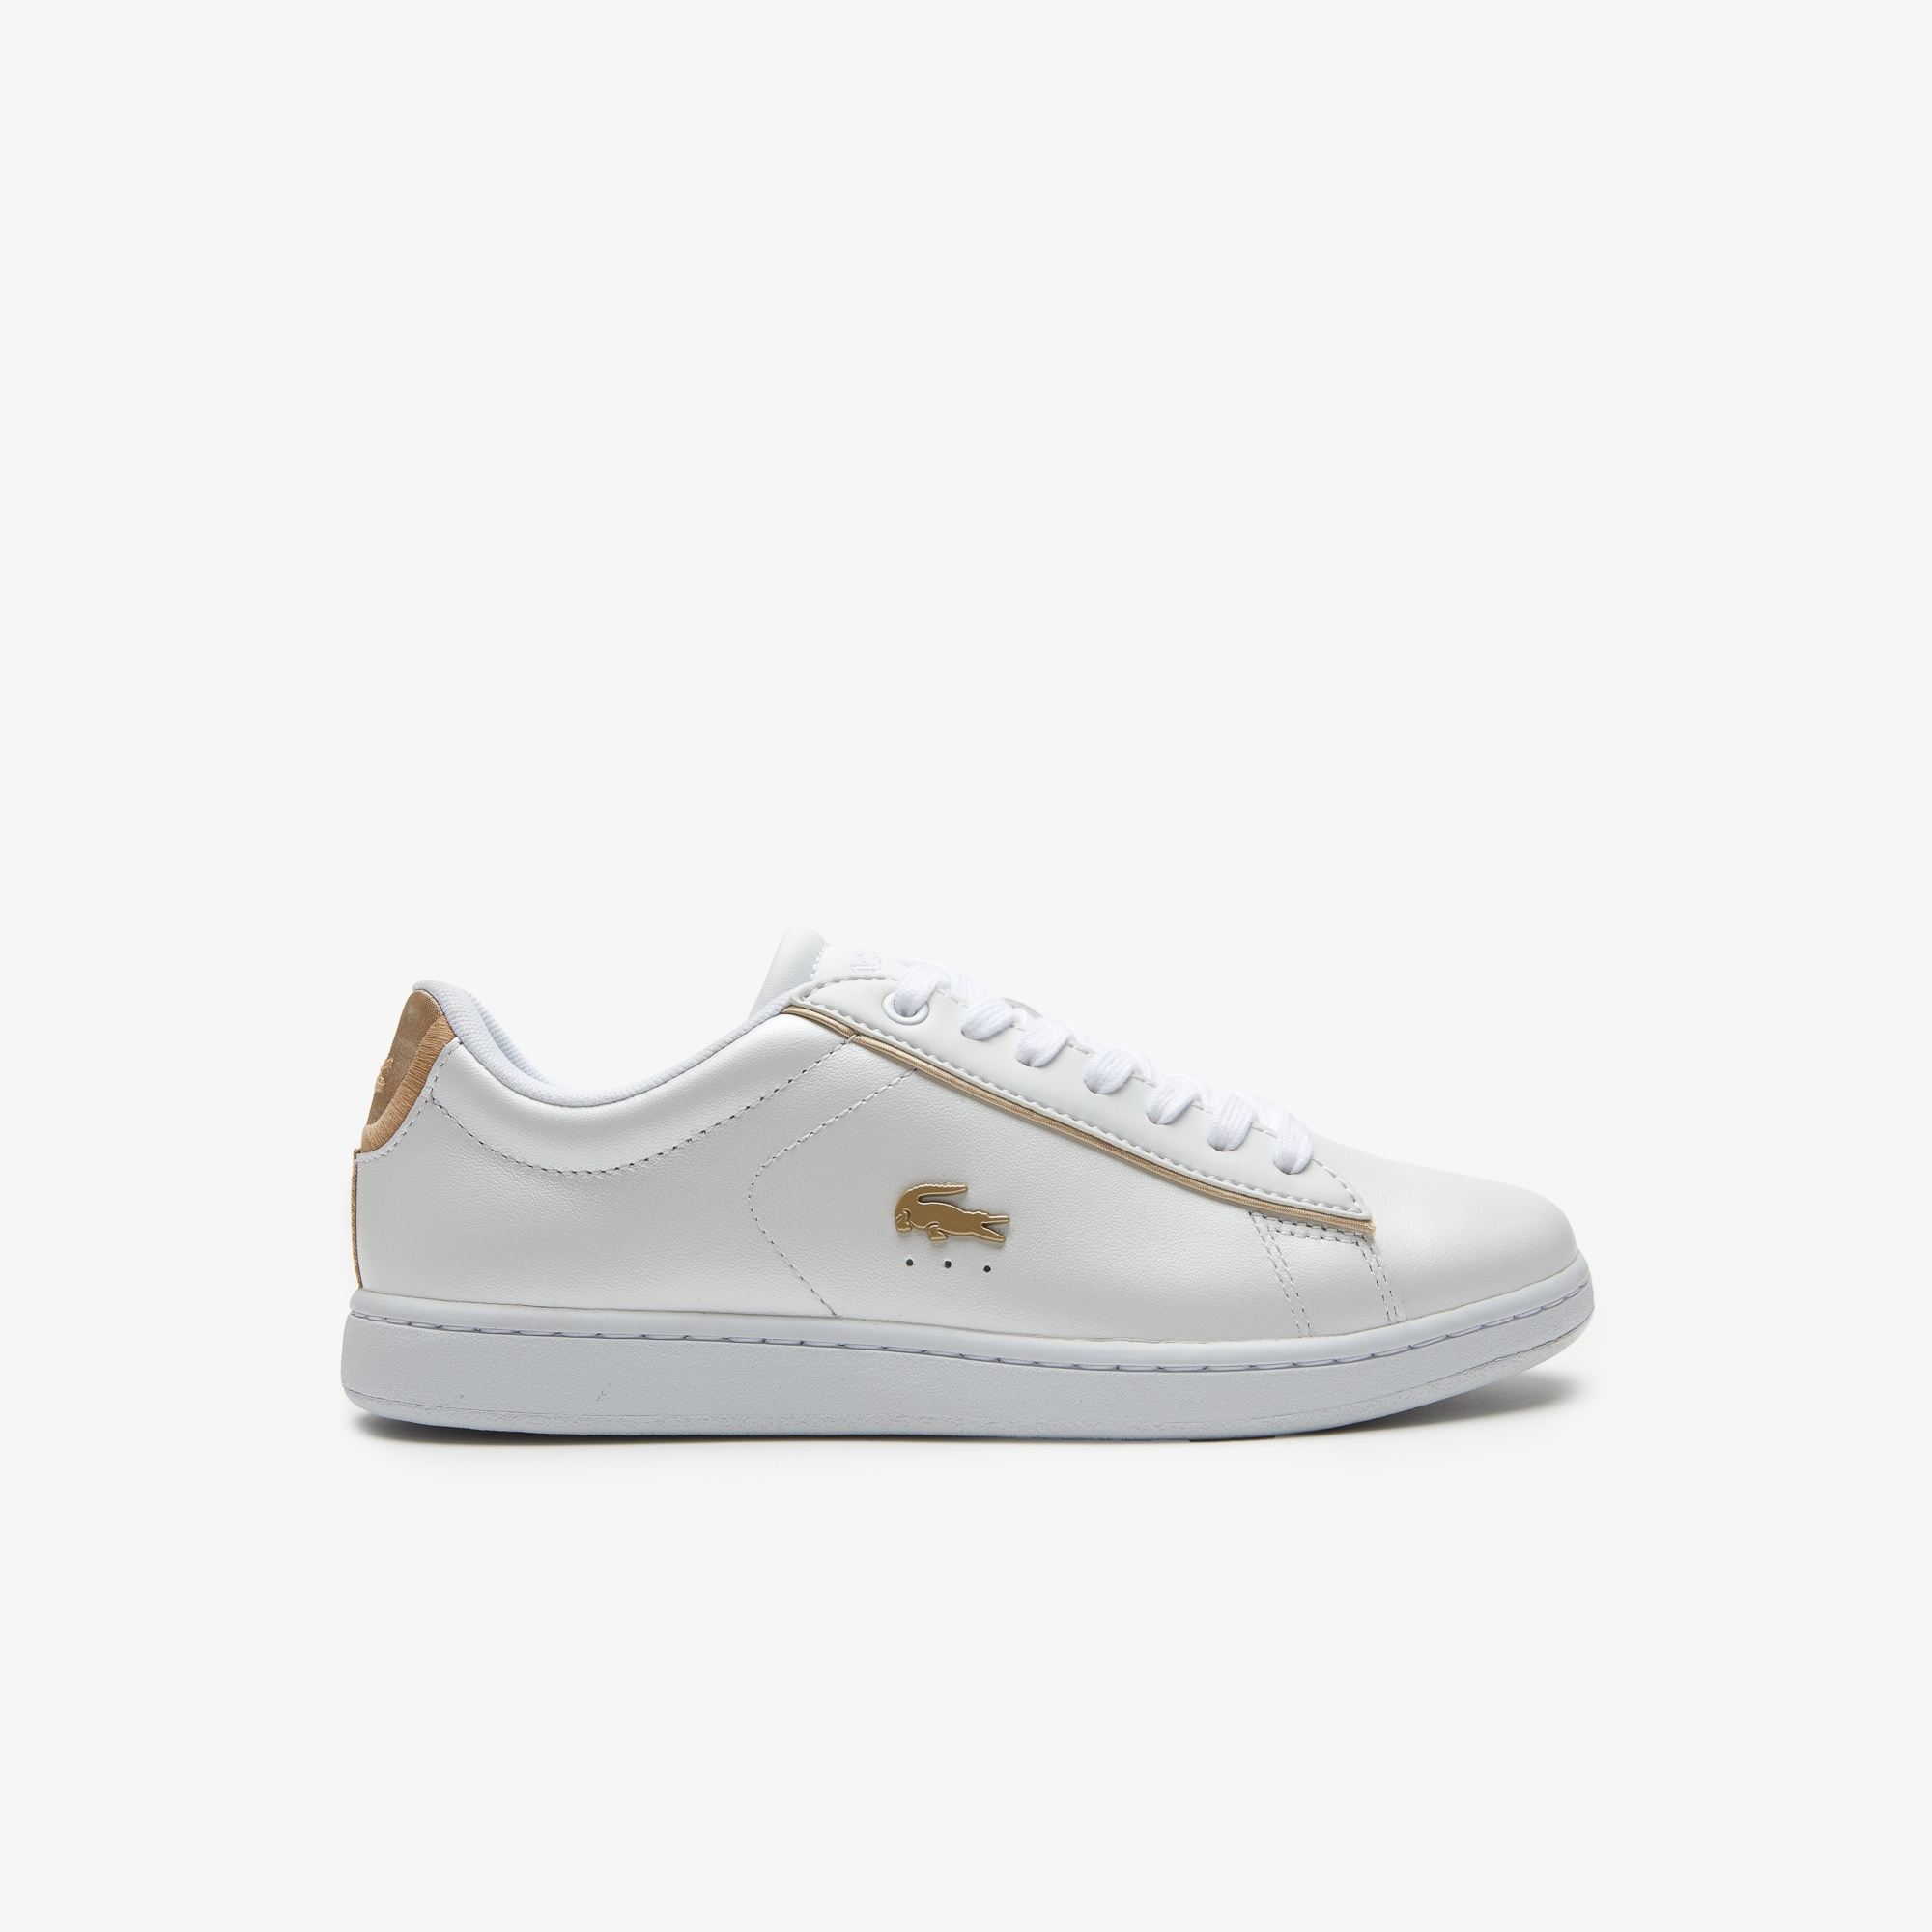 fd430420f6c Guide des tailles - Chaussures femme